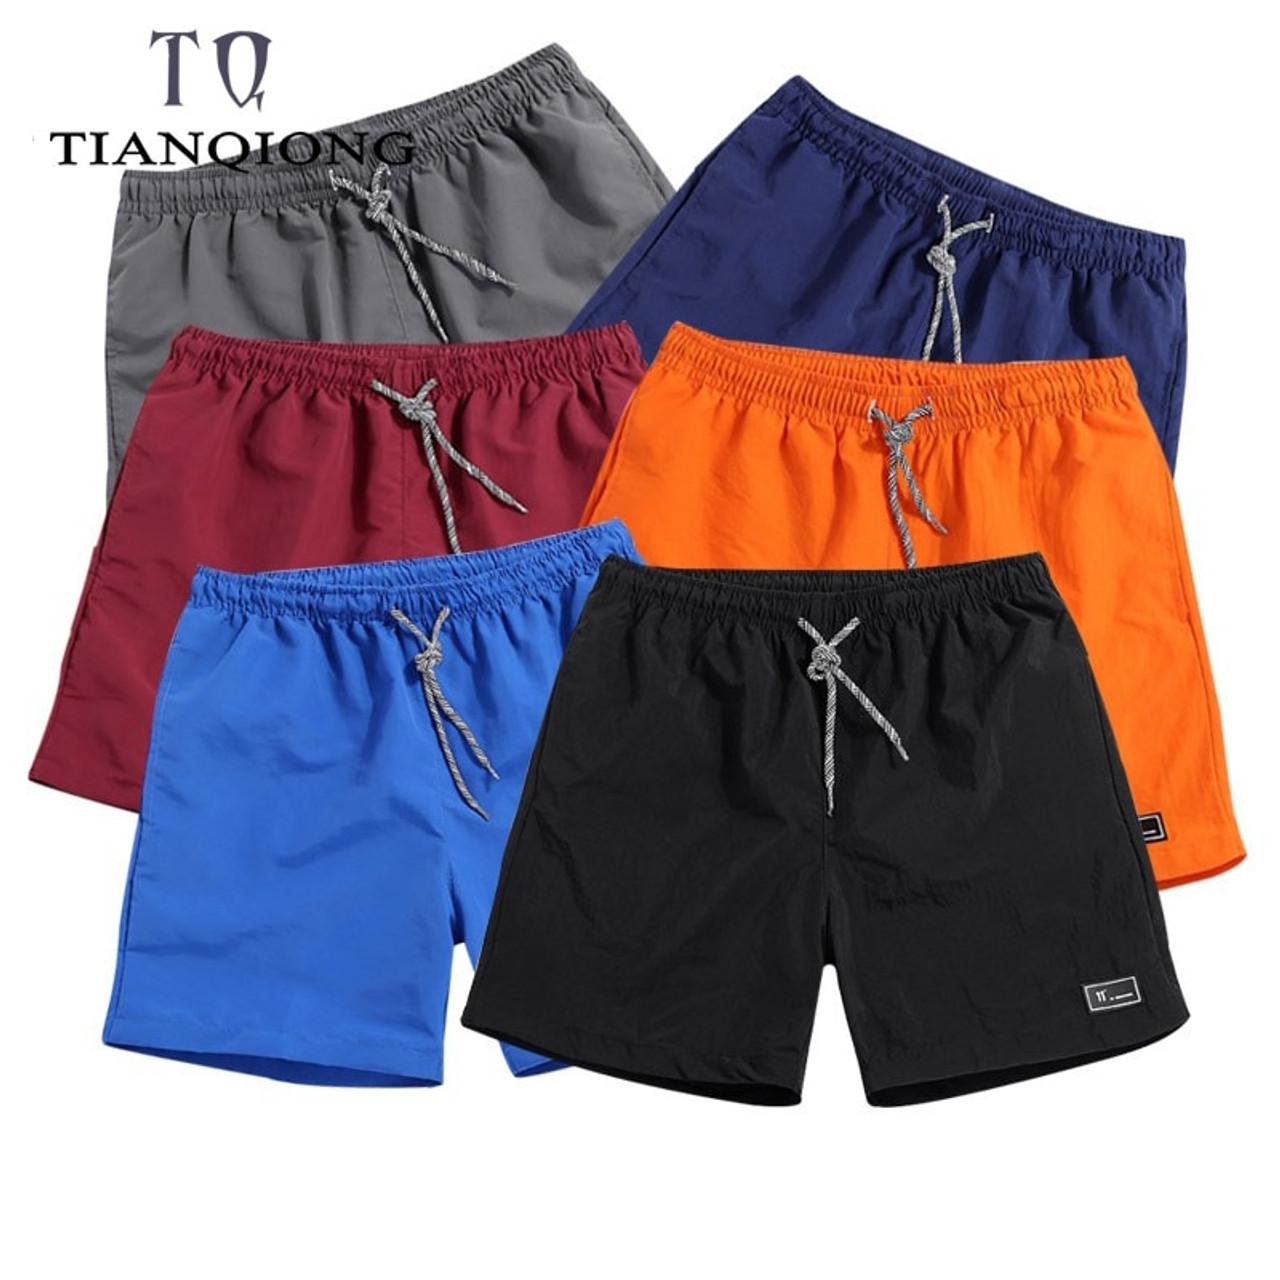 6cc571e252 2019 New arrive Mens Shorts Surf Board Shorts Summer Sport Beach Homme  Bermuda Short Pants Quick ...